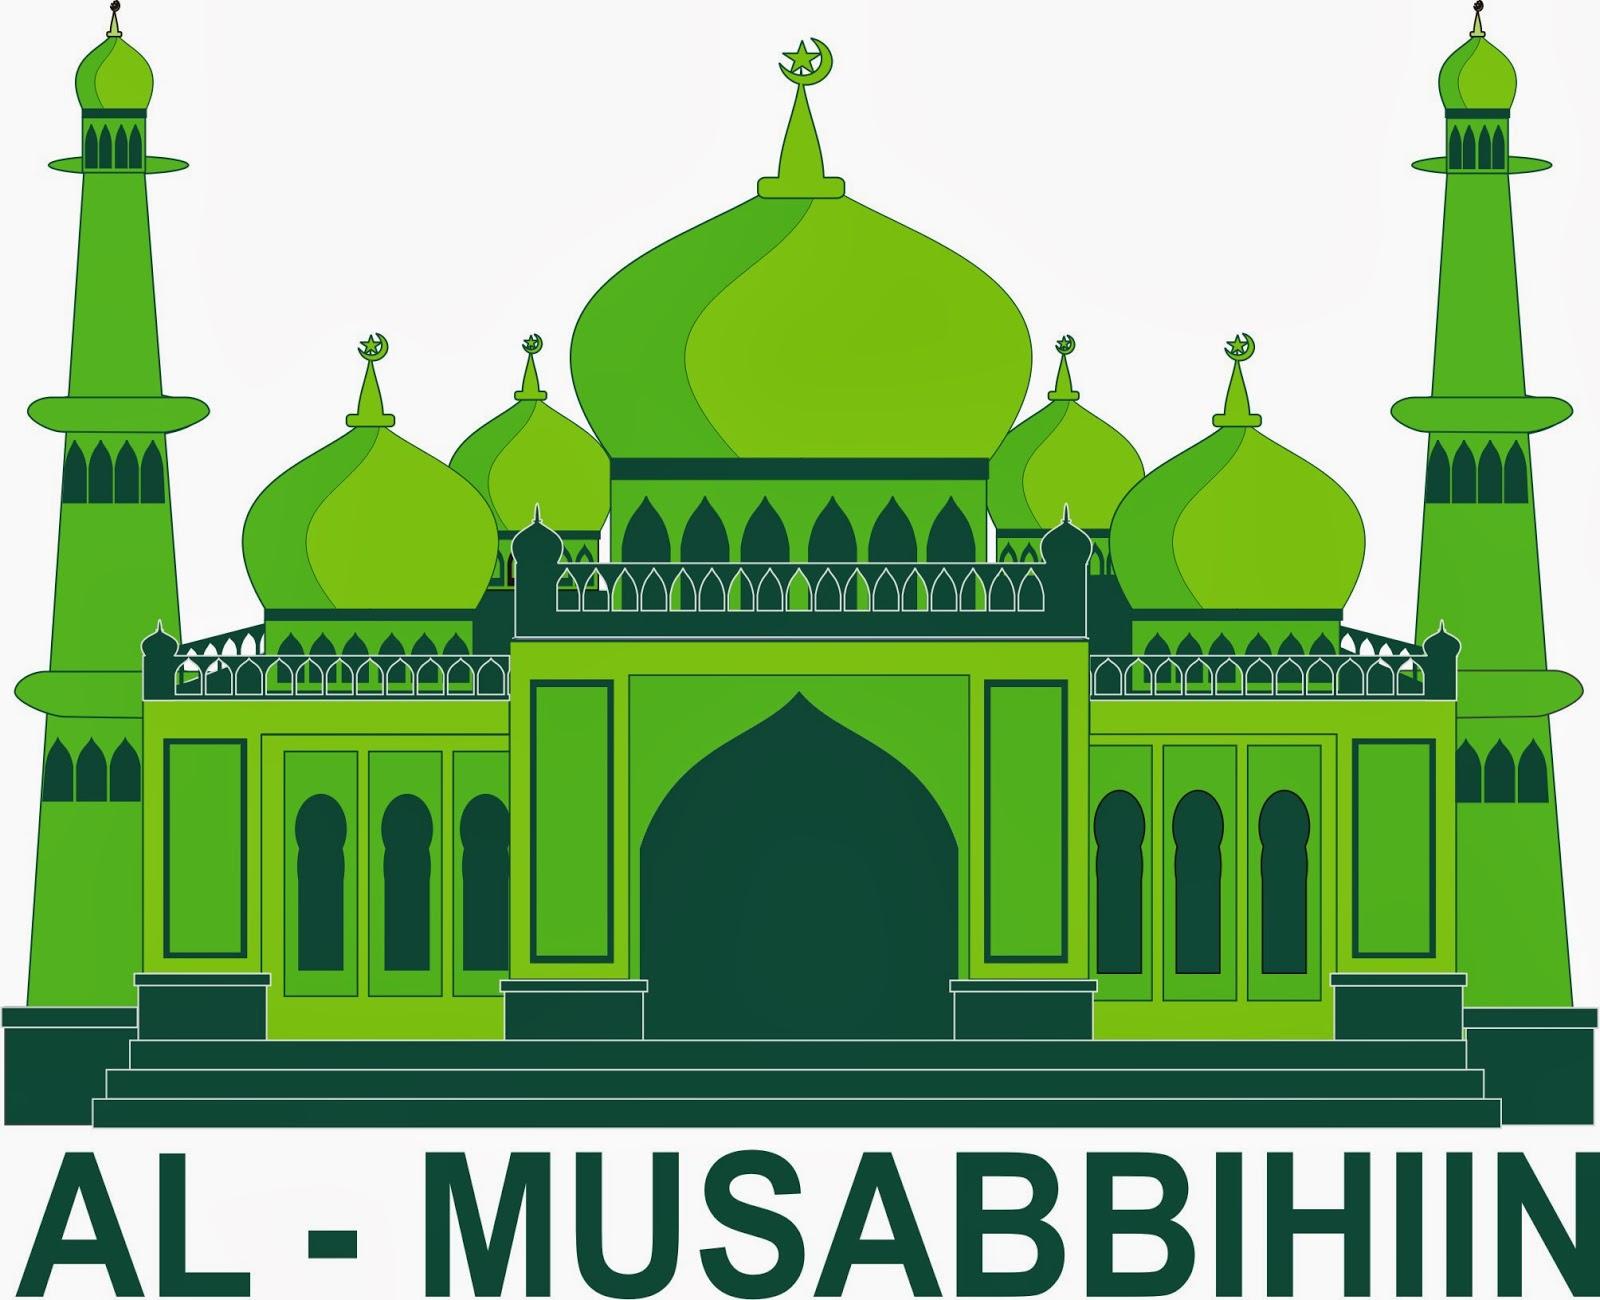 Logo Gambar Masjid Related Keywords & Suggestions - Logo Gambar Masjid ...